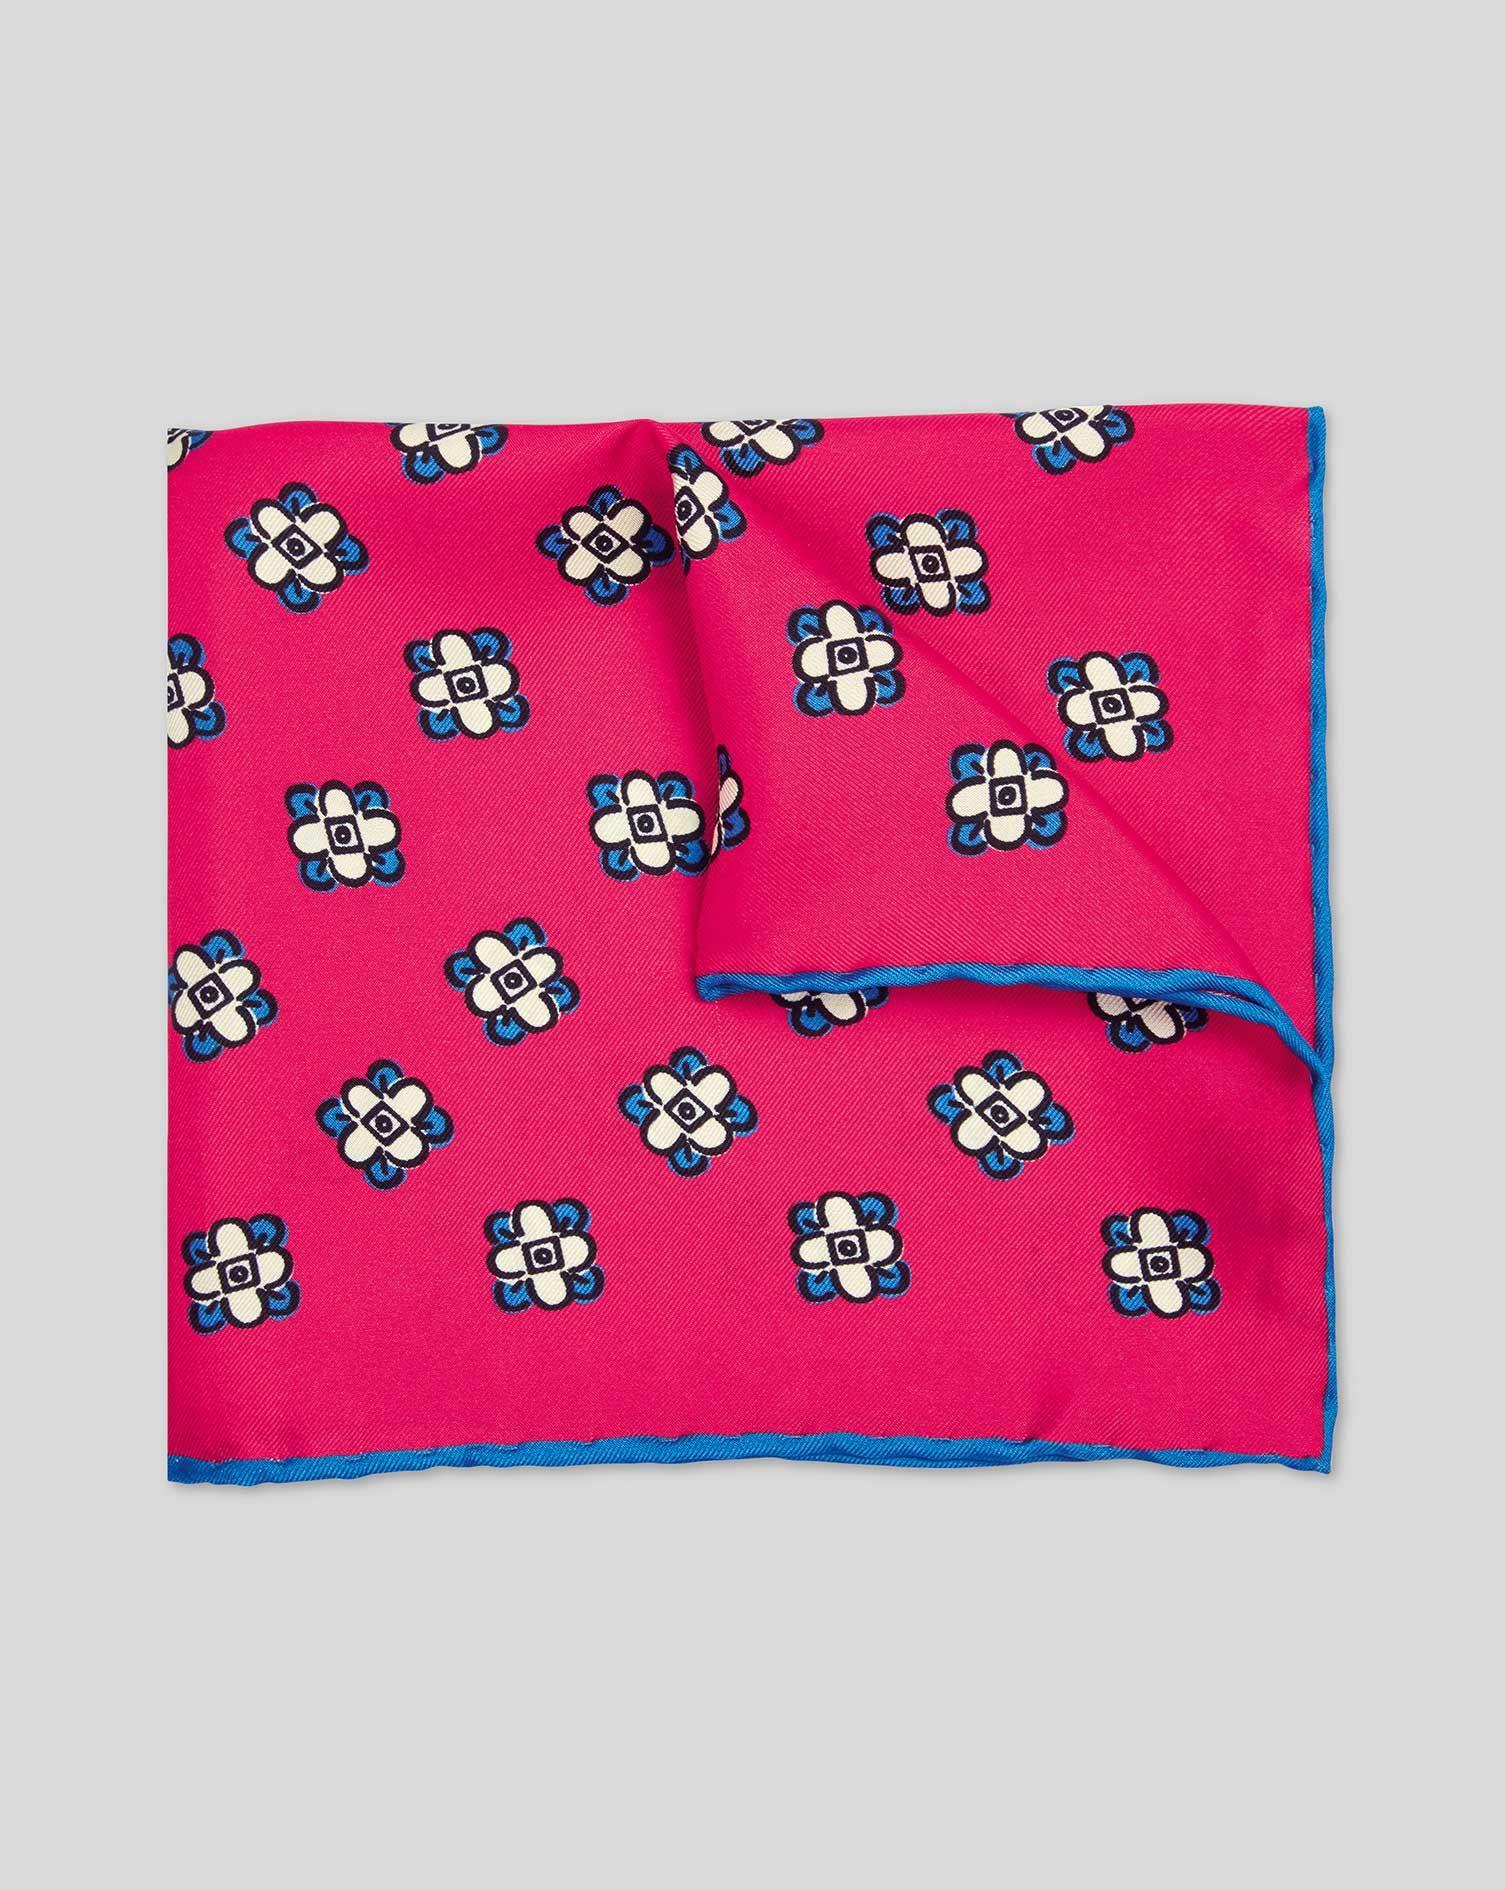 Floral Geometric Print Pocket Square - Bright Pink